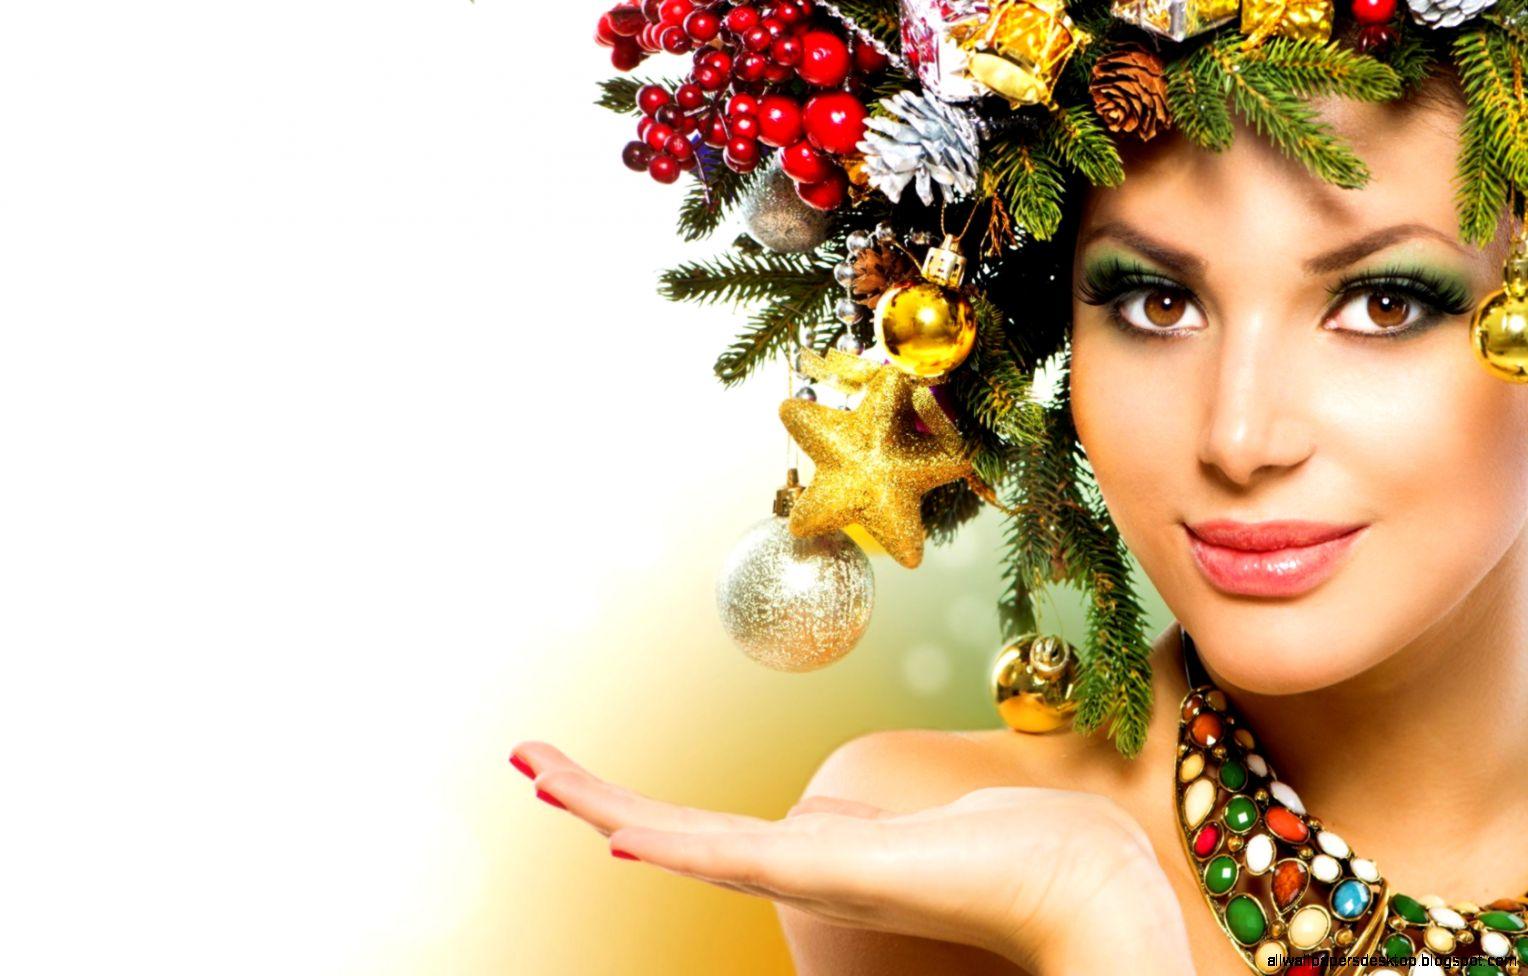 girl happiness make up laurel christmas new year photo wallpaper